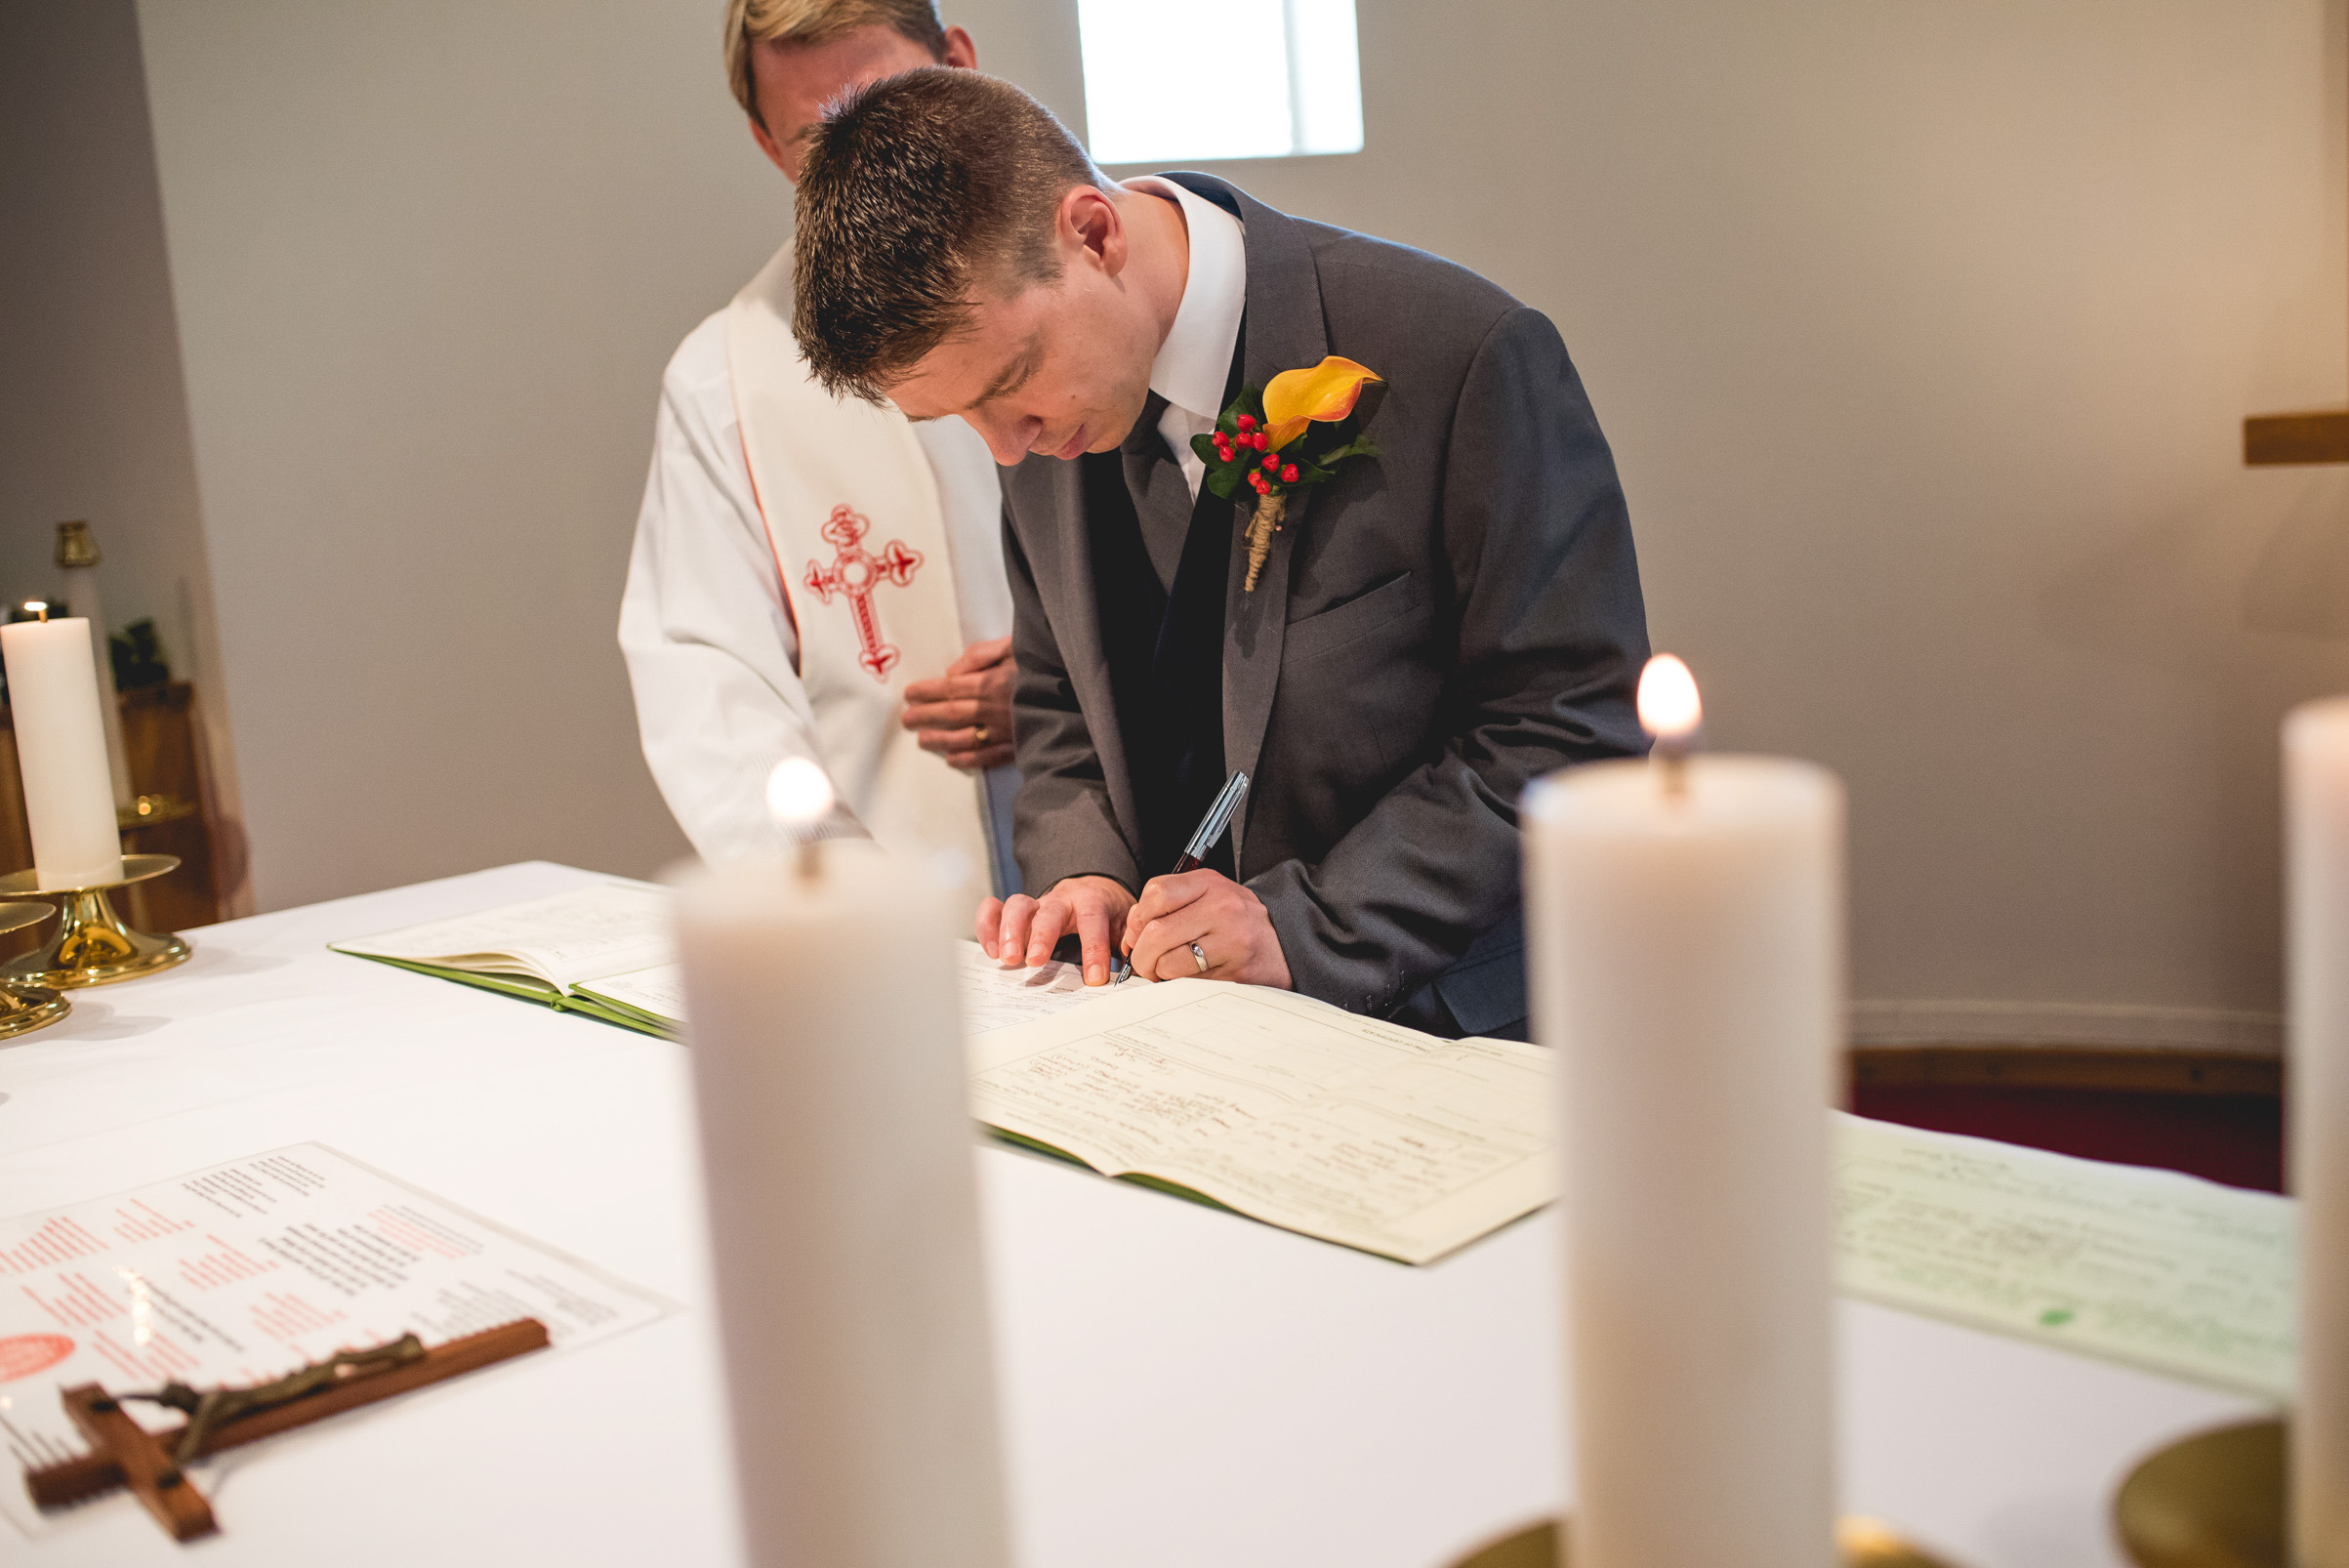 The+Fairlawns+wedding+Aldridge+StLukes+Church-100.jpg